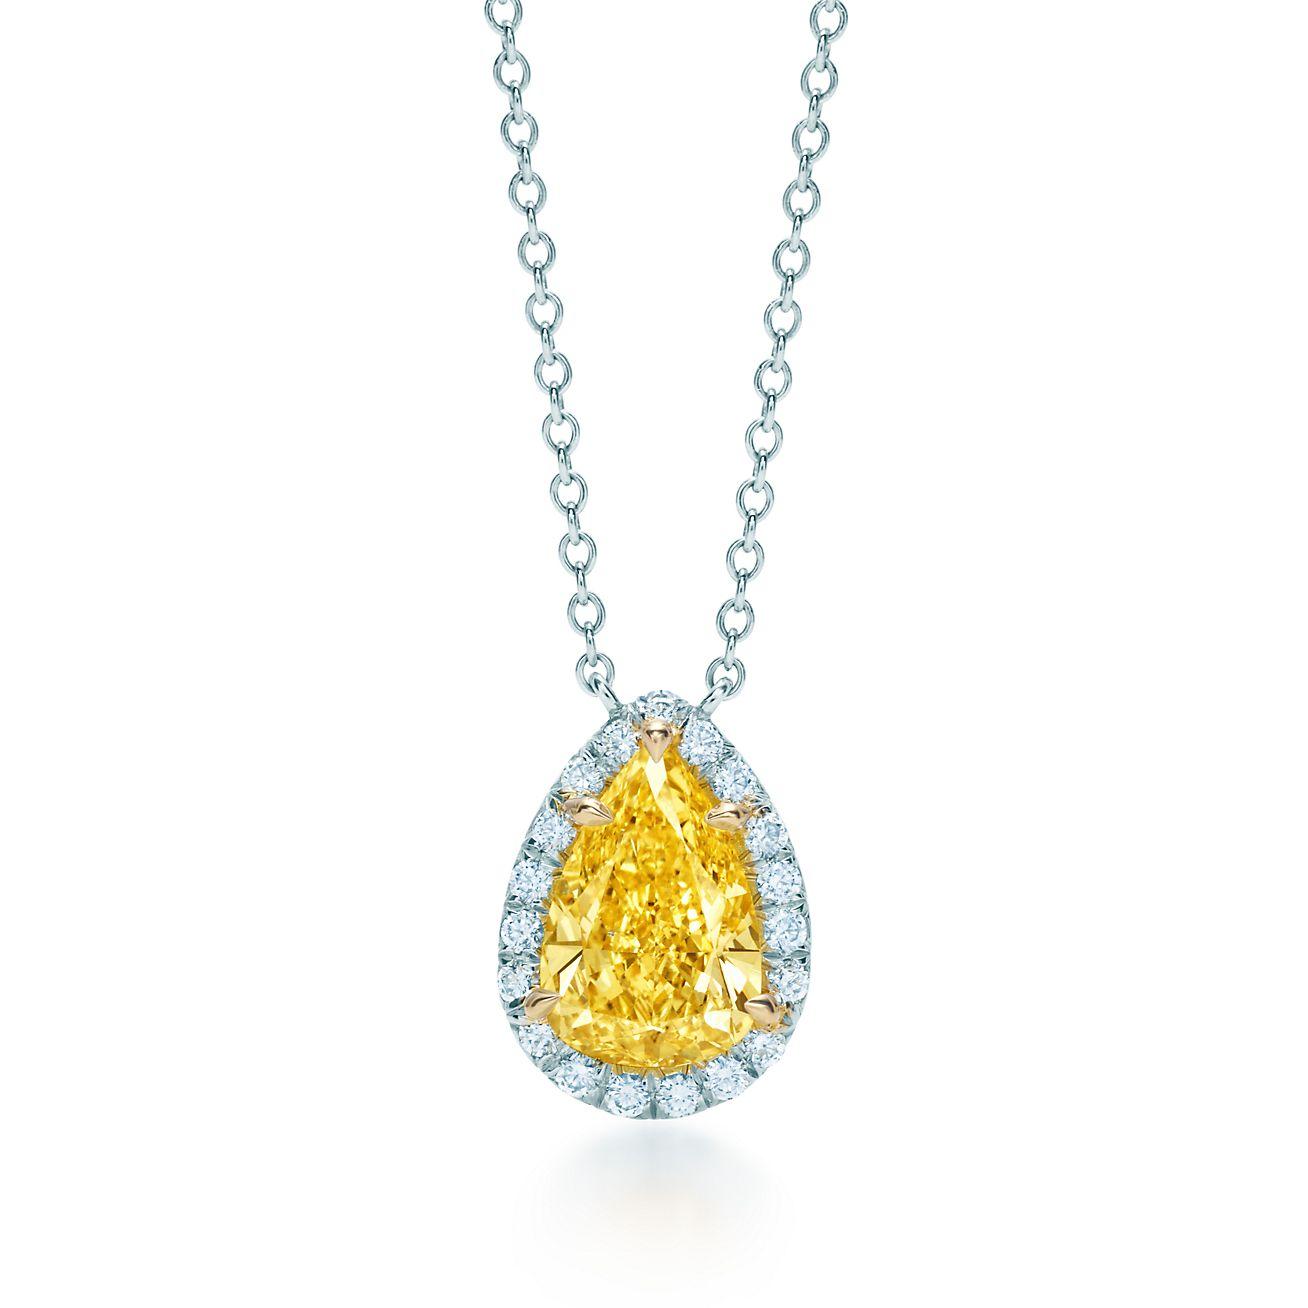 Tiffany soleste yellow and white diamond pendant in platinum and tiffany solesteyellow diamond pendant aloadofball Gallery